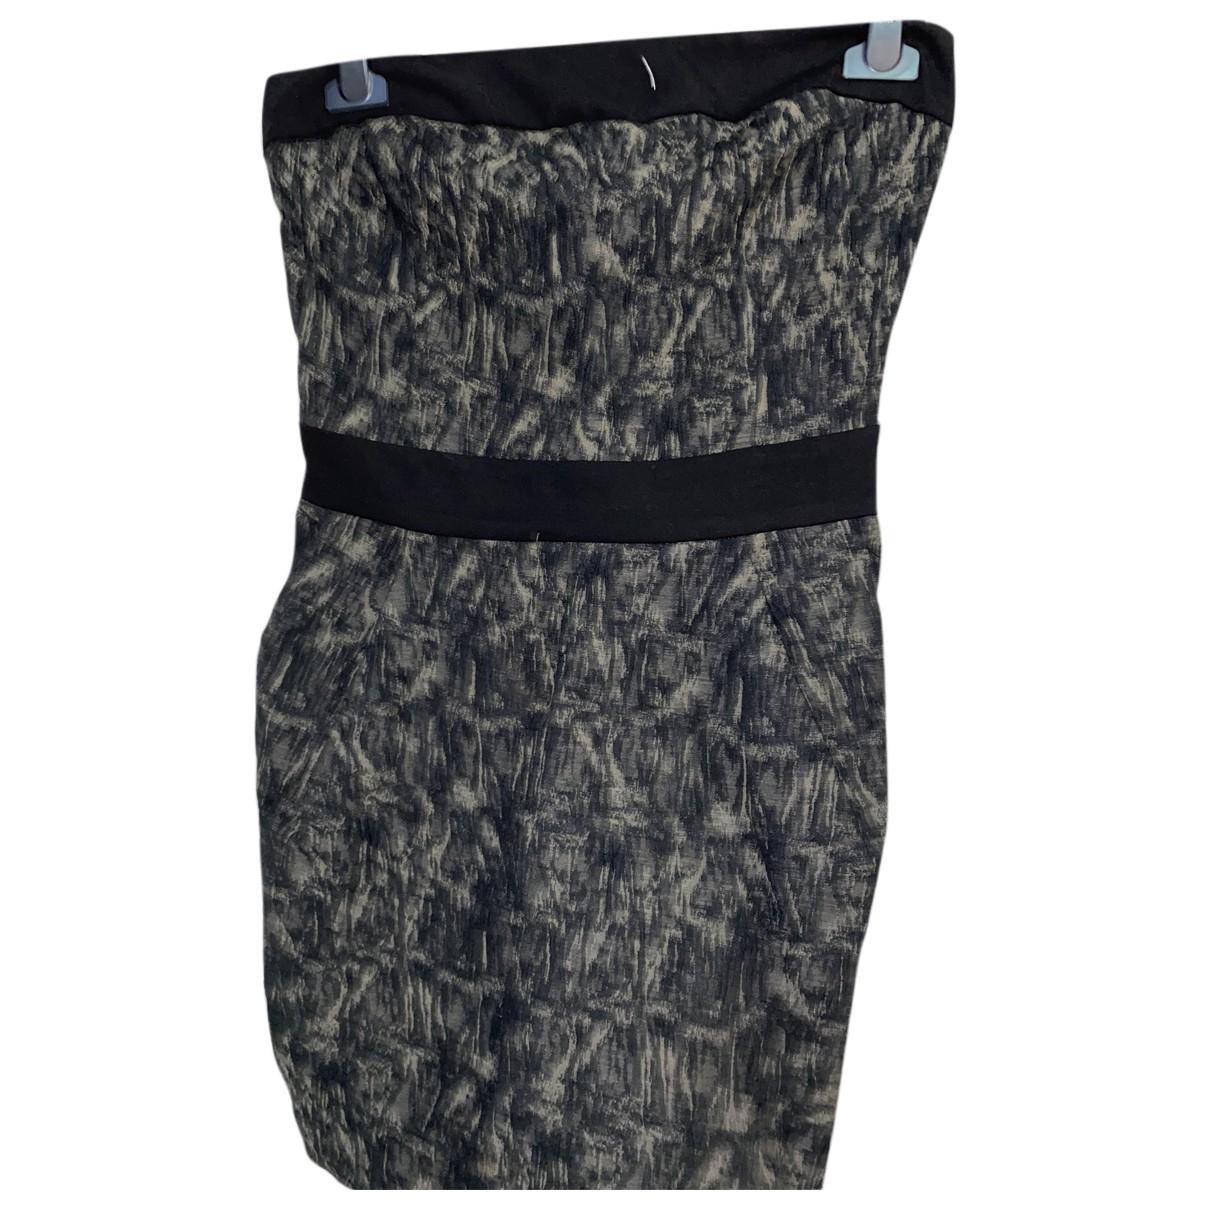 Imperial - Robe   pour femme en coton - elasthane - noir